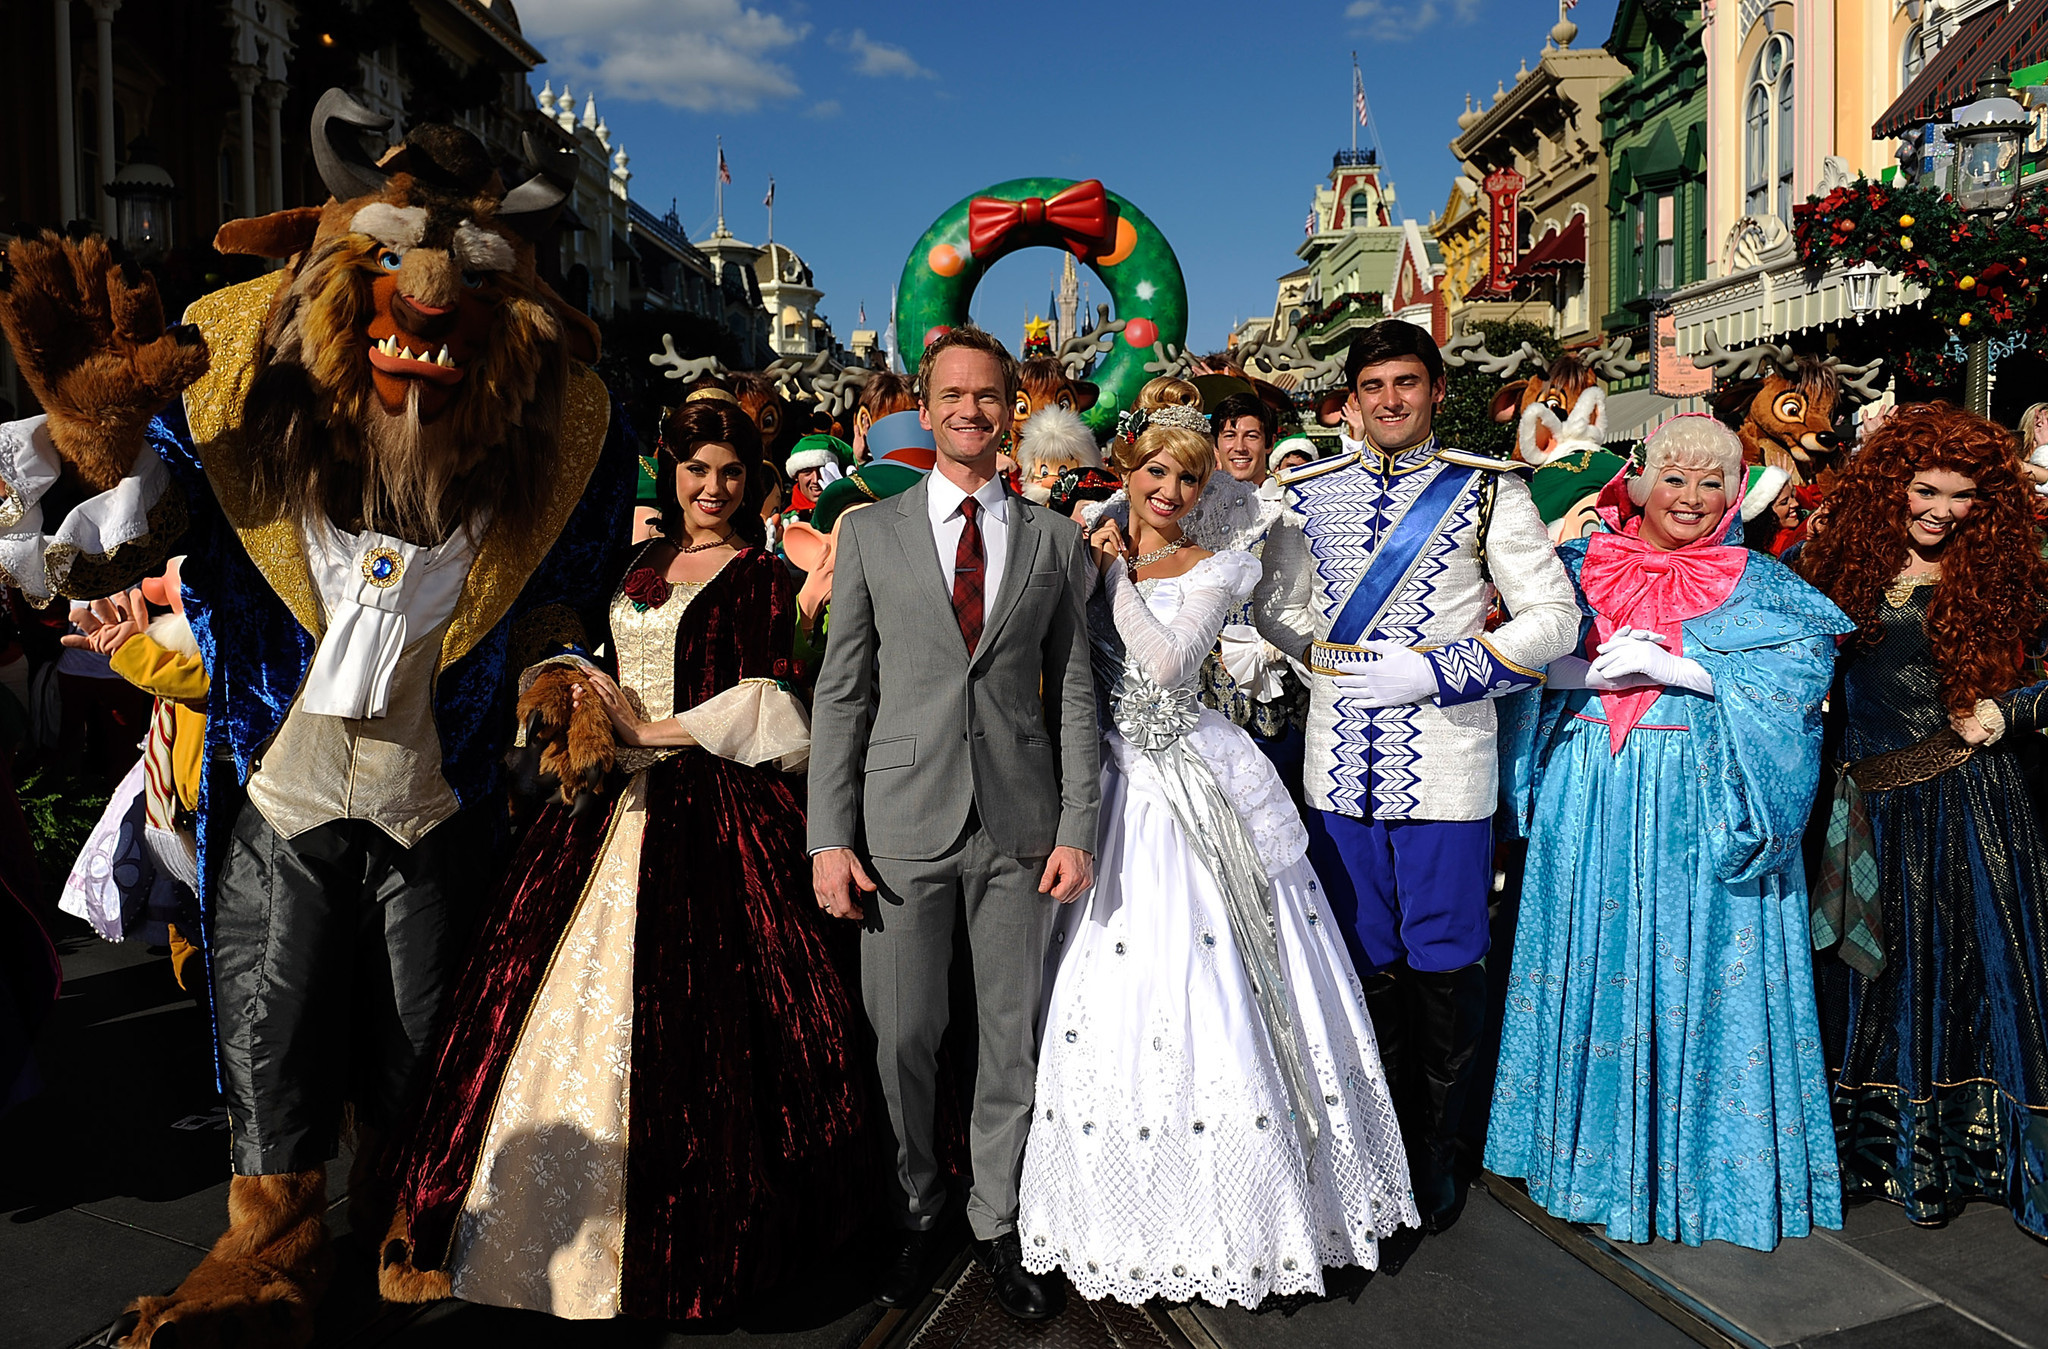 Disney Christmas Parade.Disney Christmas Parade Has Hits Misses Orlando Sentinel